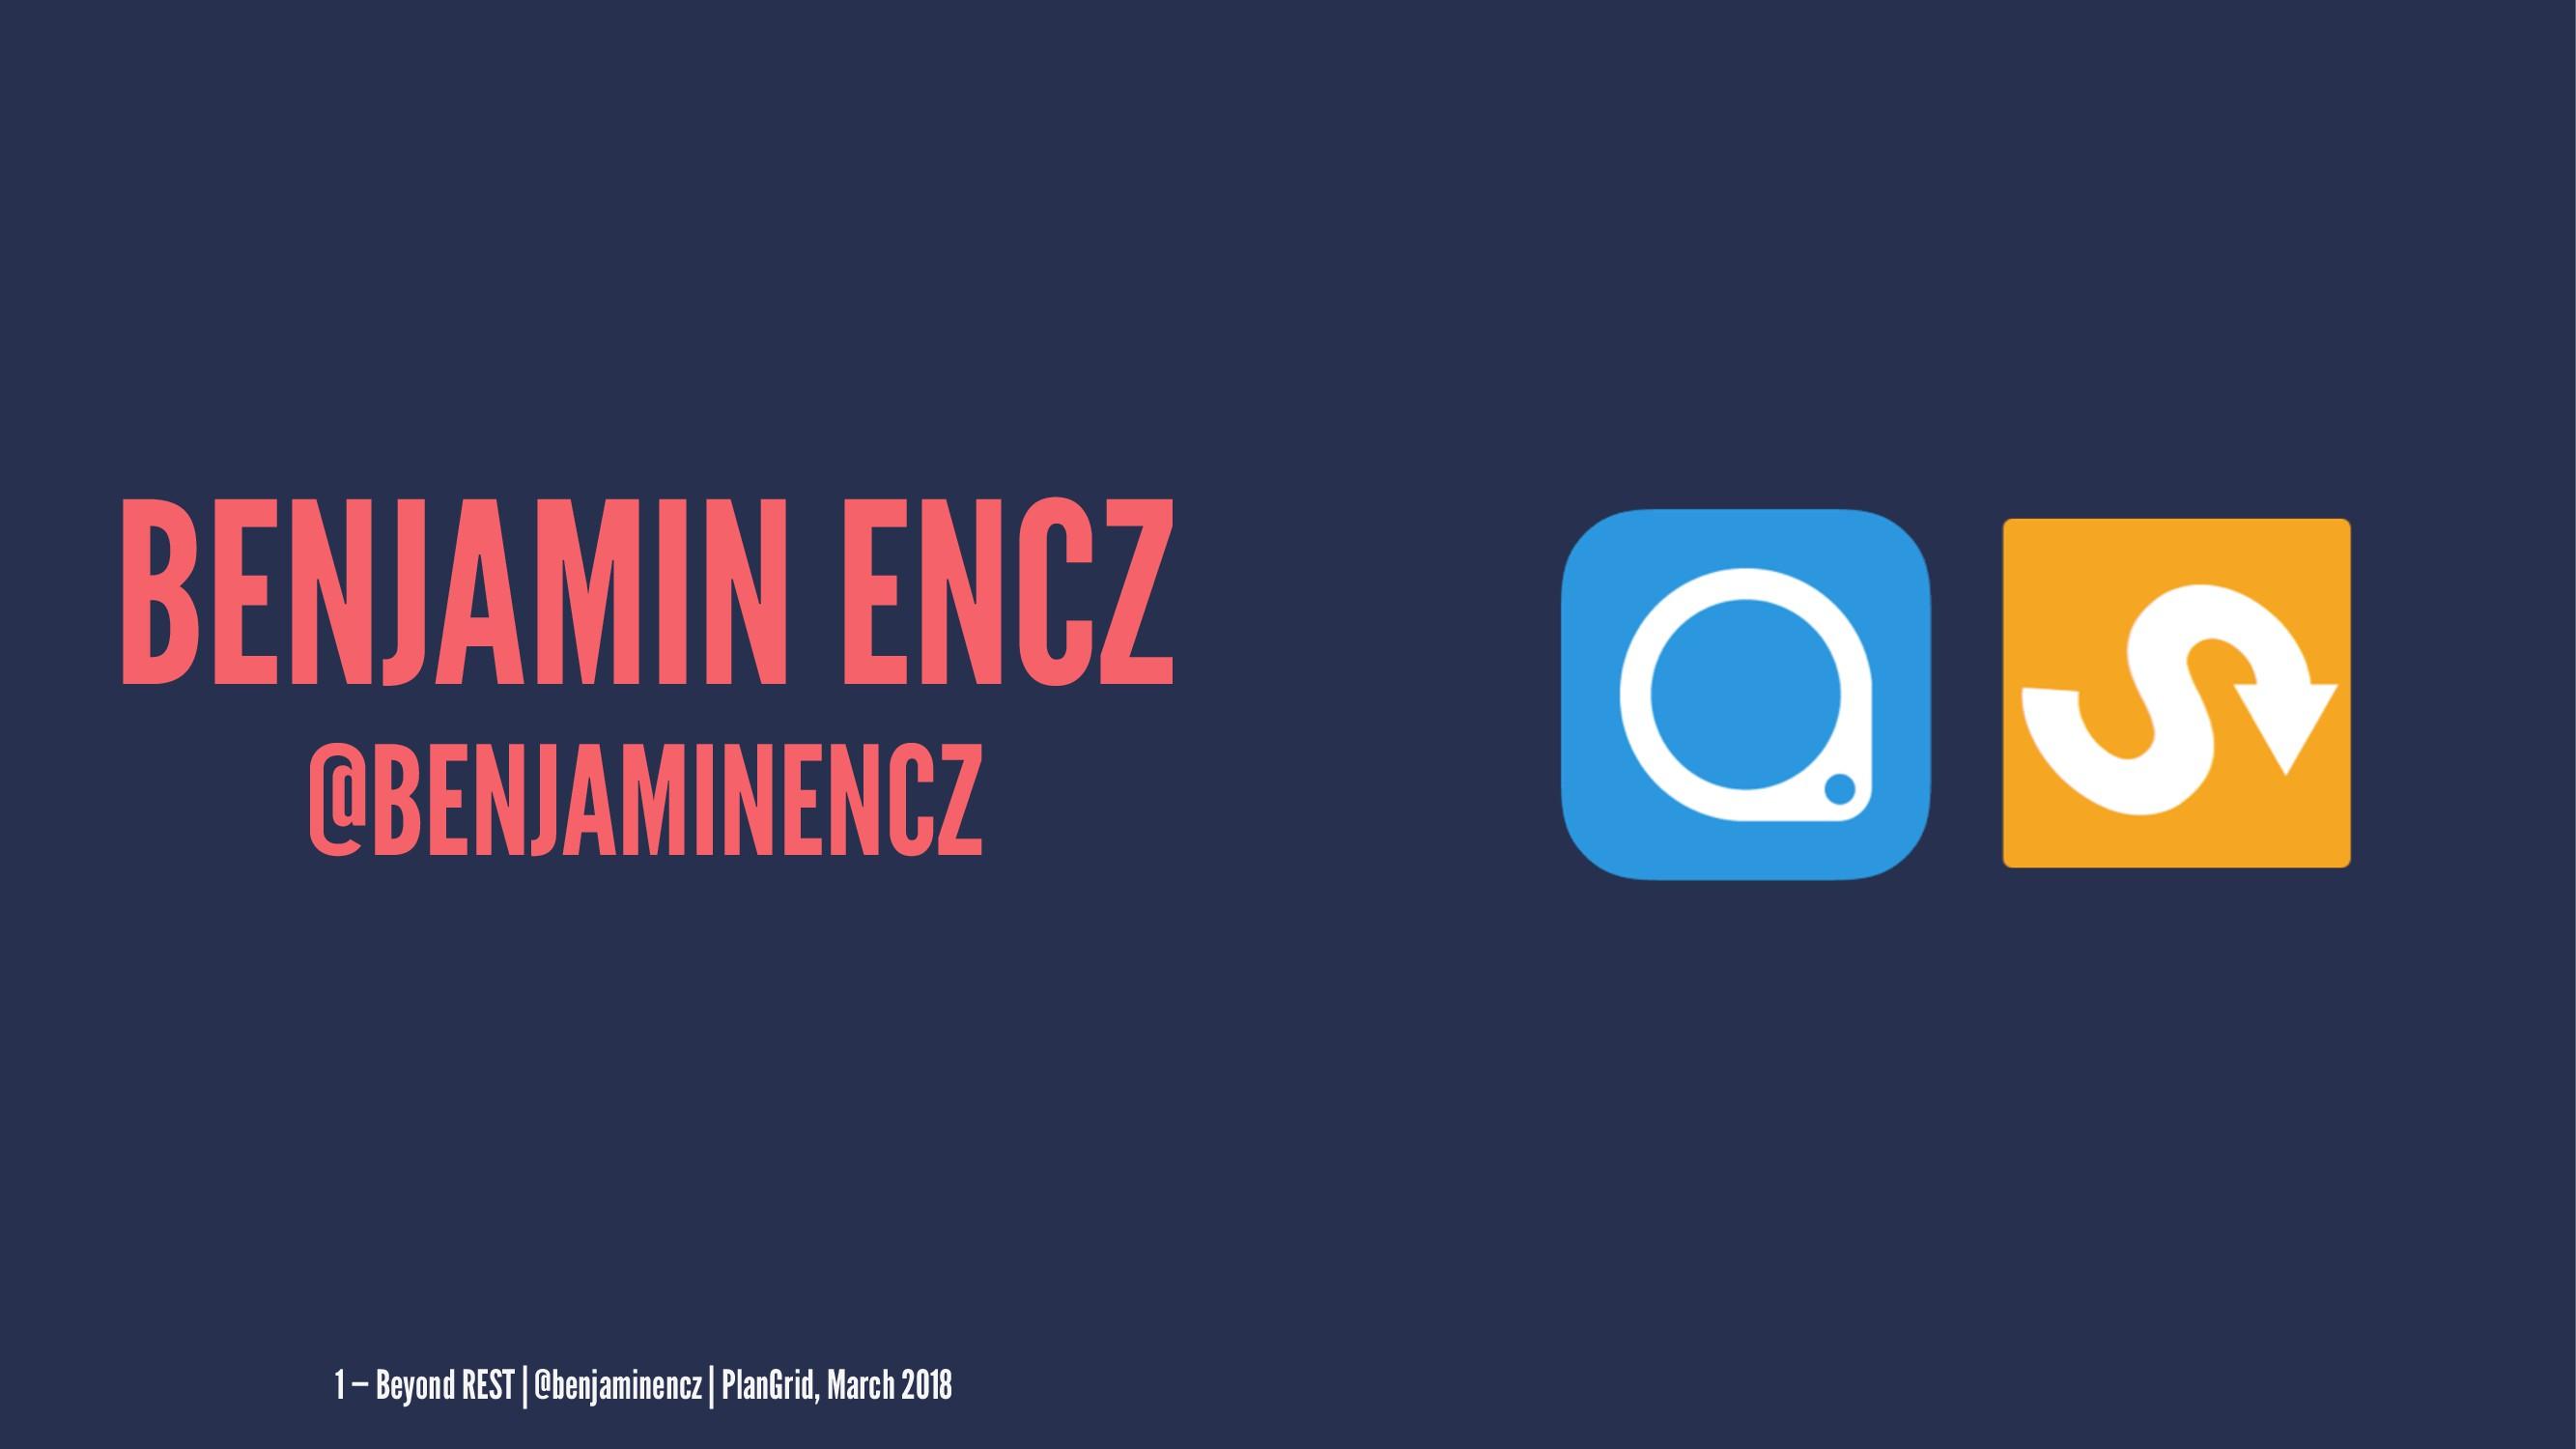 BENJAMIN ENCZ @BENJAMINENCZ 1 — Beyond REST | @...